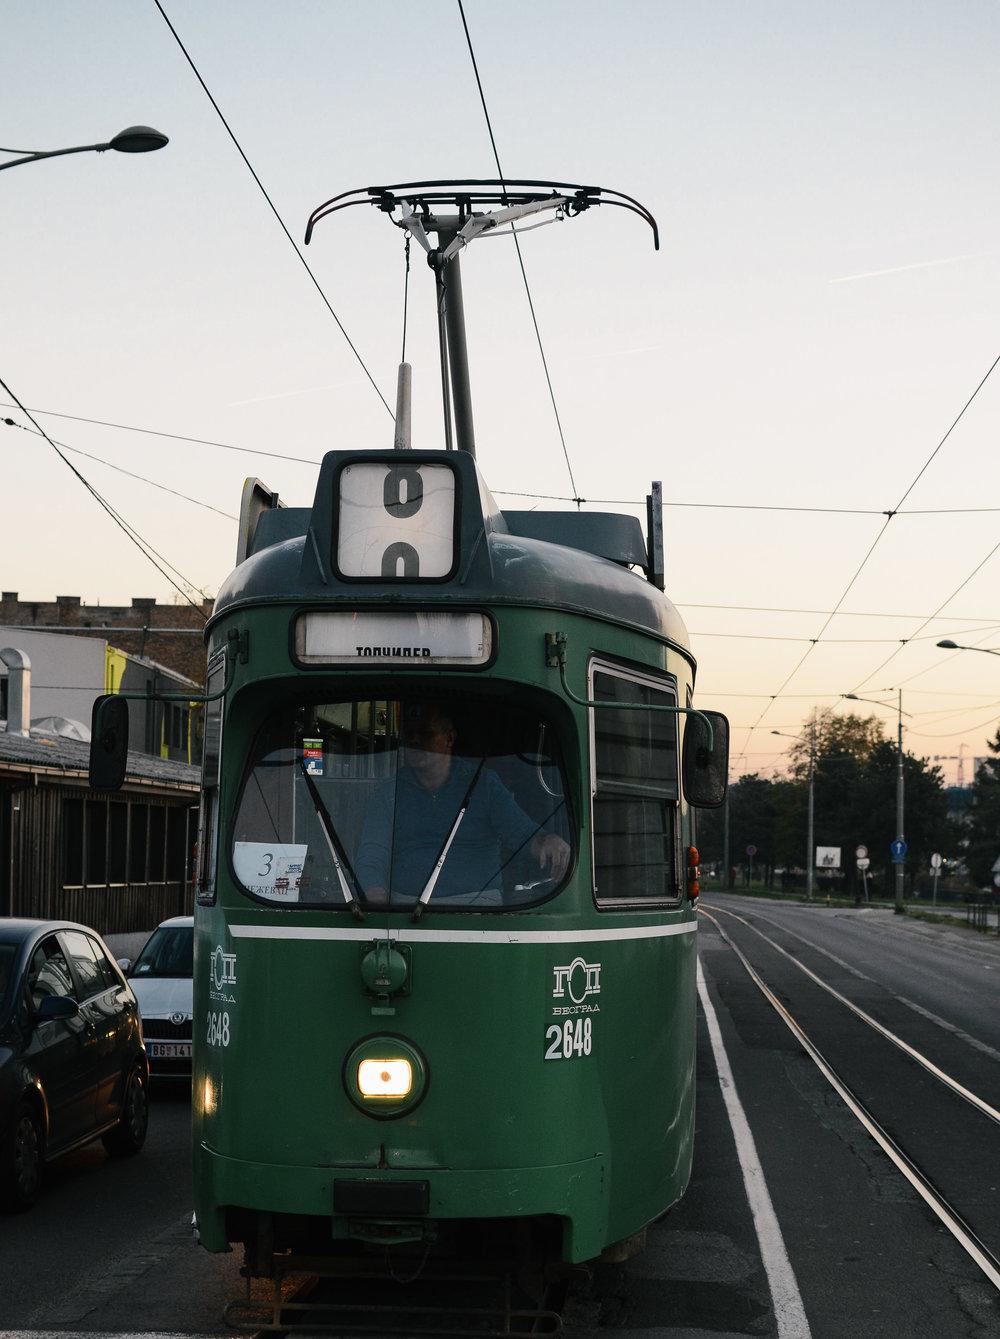 belgrade-serbia-travel-guide-lifeonpine_DSC_0357.jpg